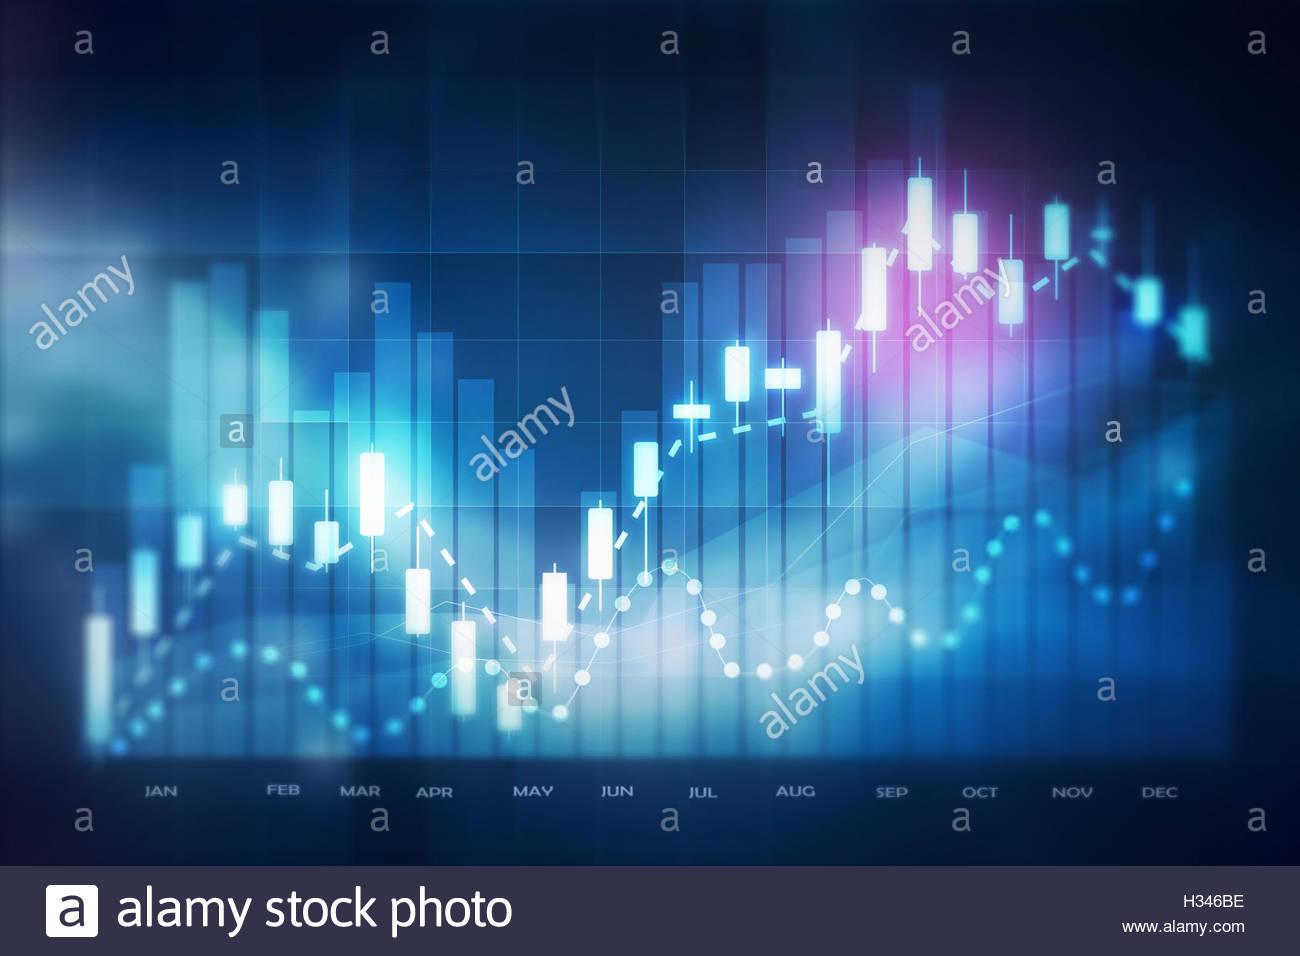 forex trading background Stock Photo 122409378   Alamy 1300x956